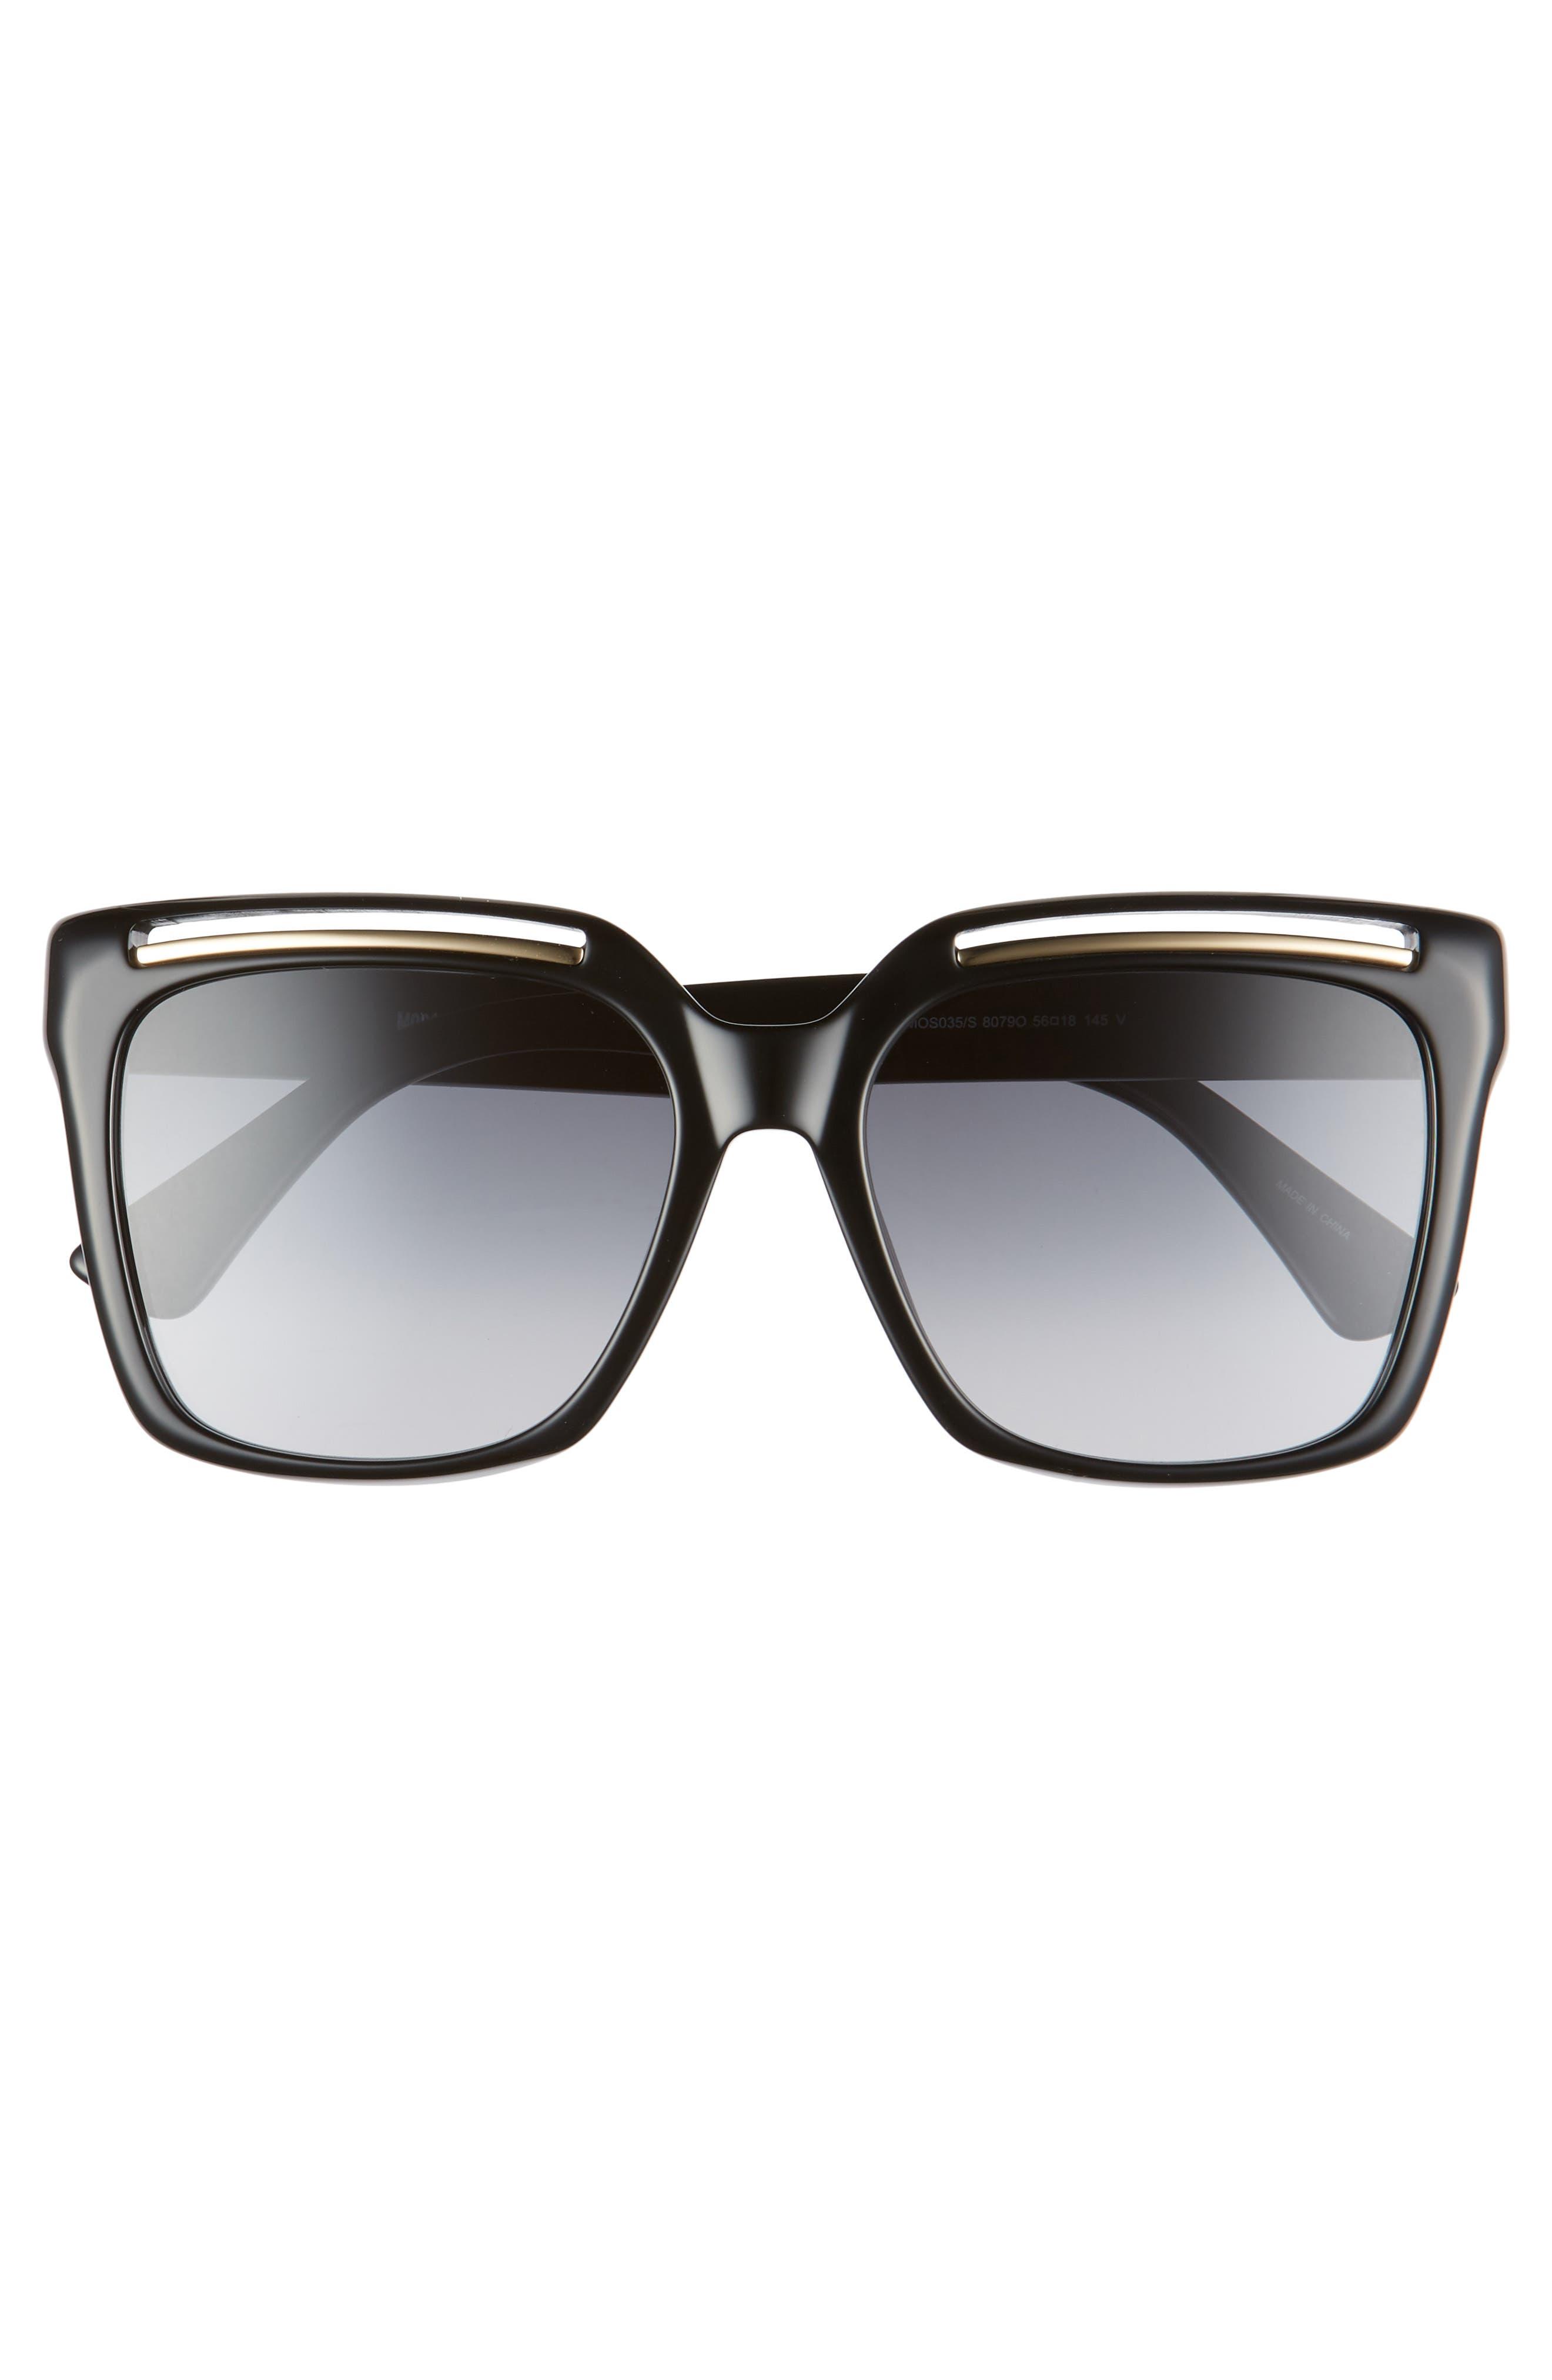 MOSCHINO, 56mm Gradient Square Sunglasses, Alternate thumbnail 3, color, BLACK